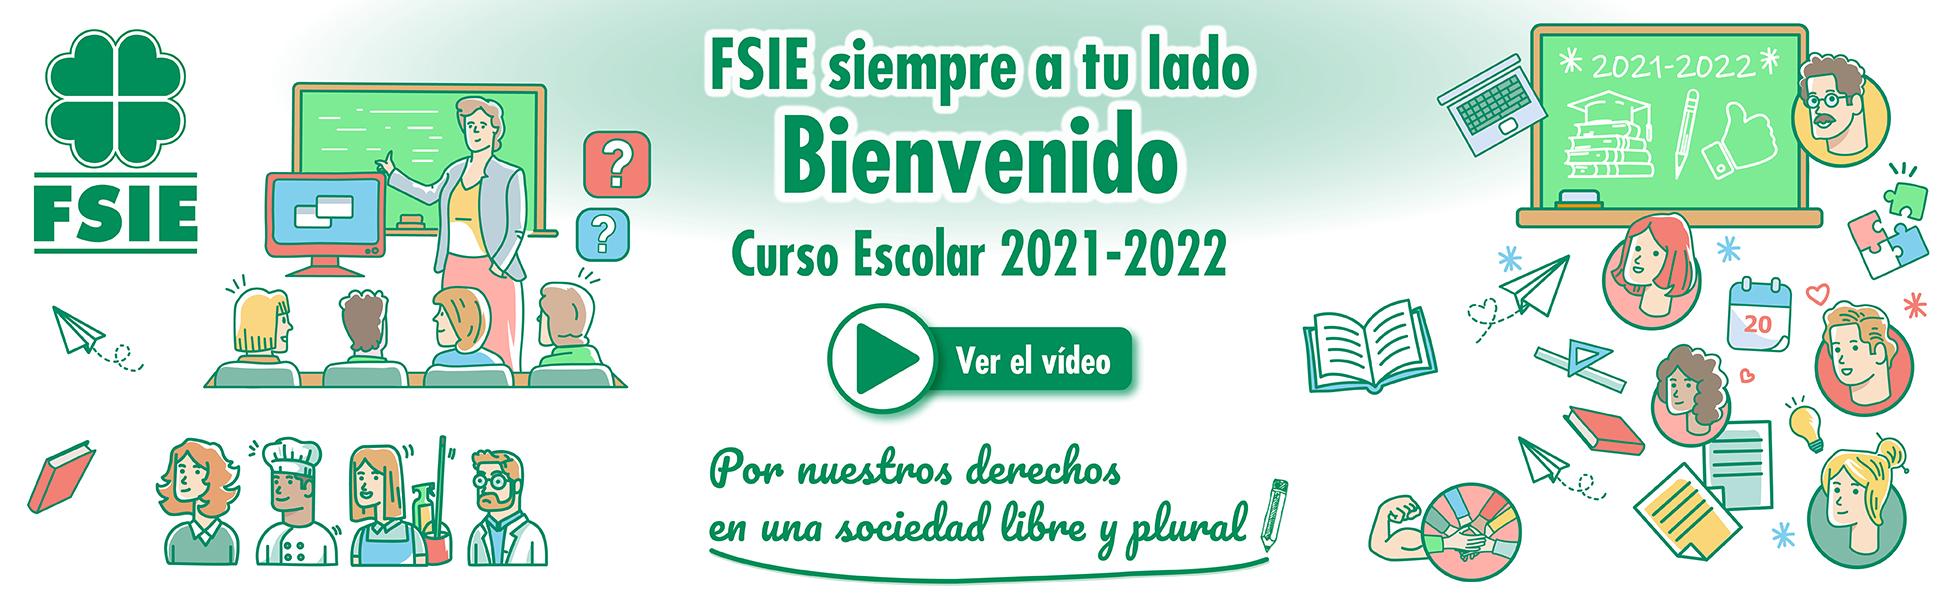 Banner Inicio curso 1959x600